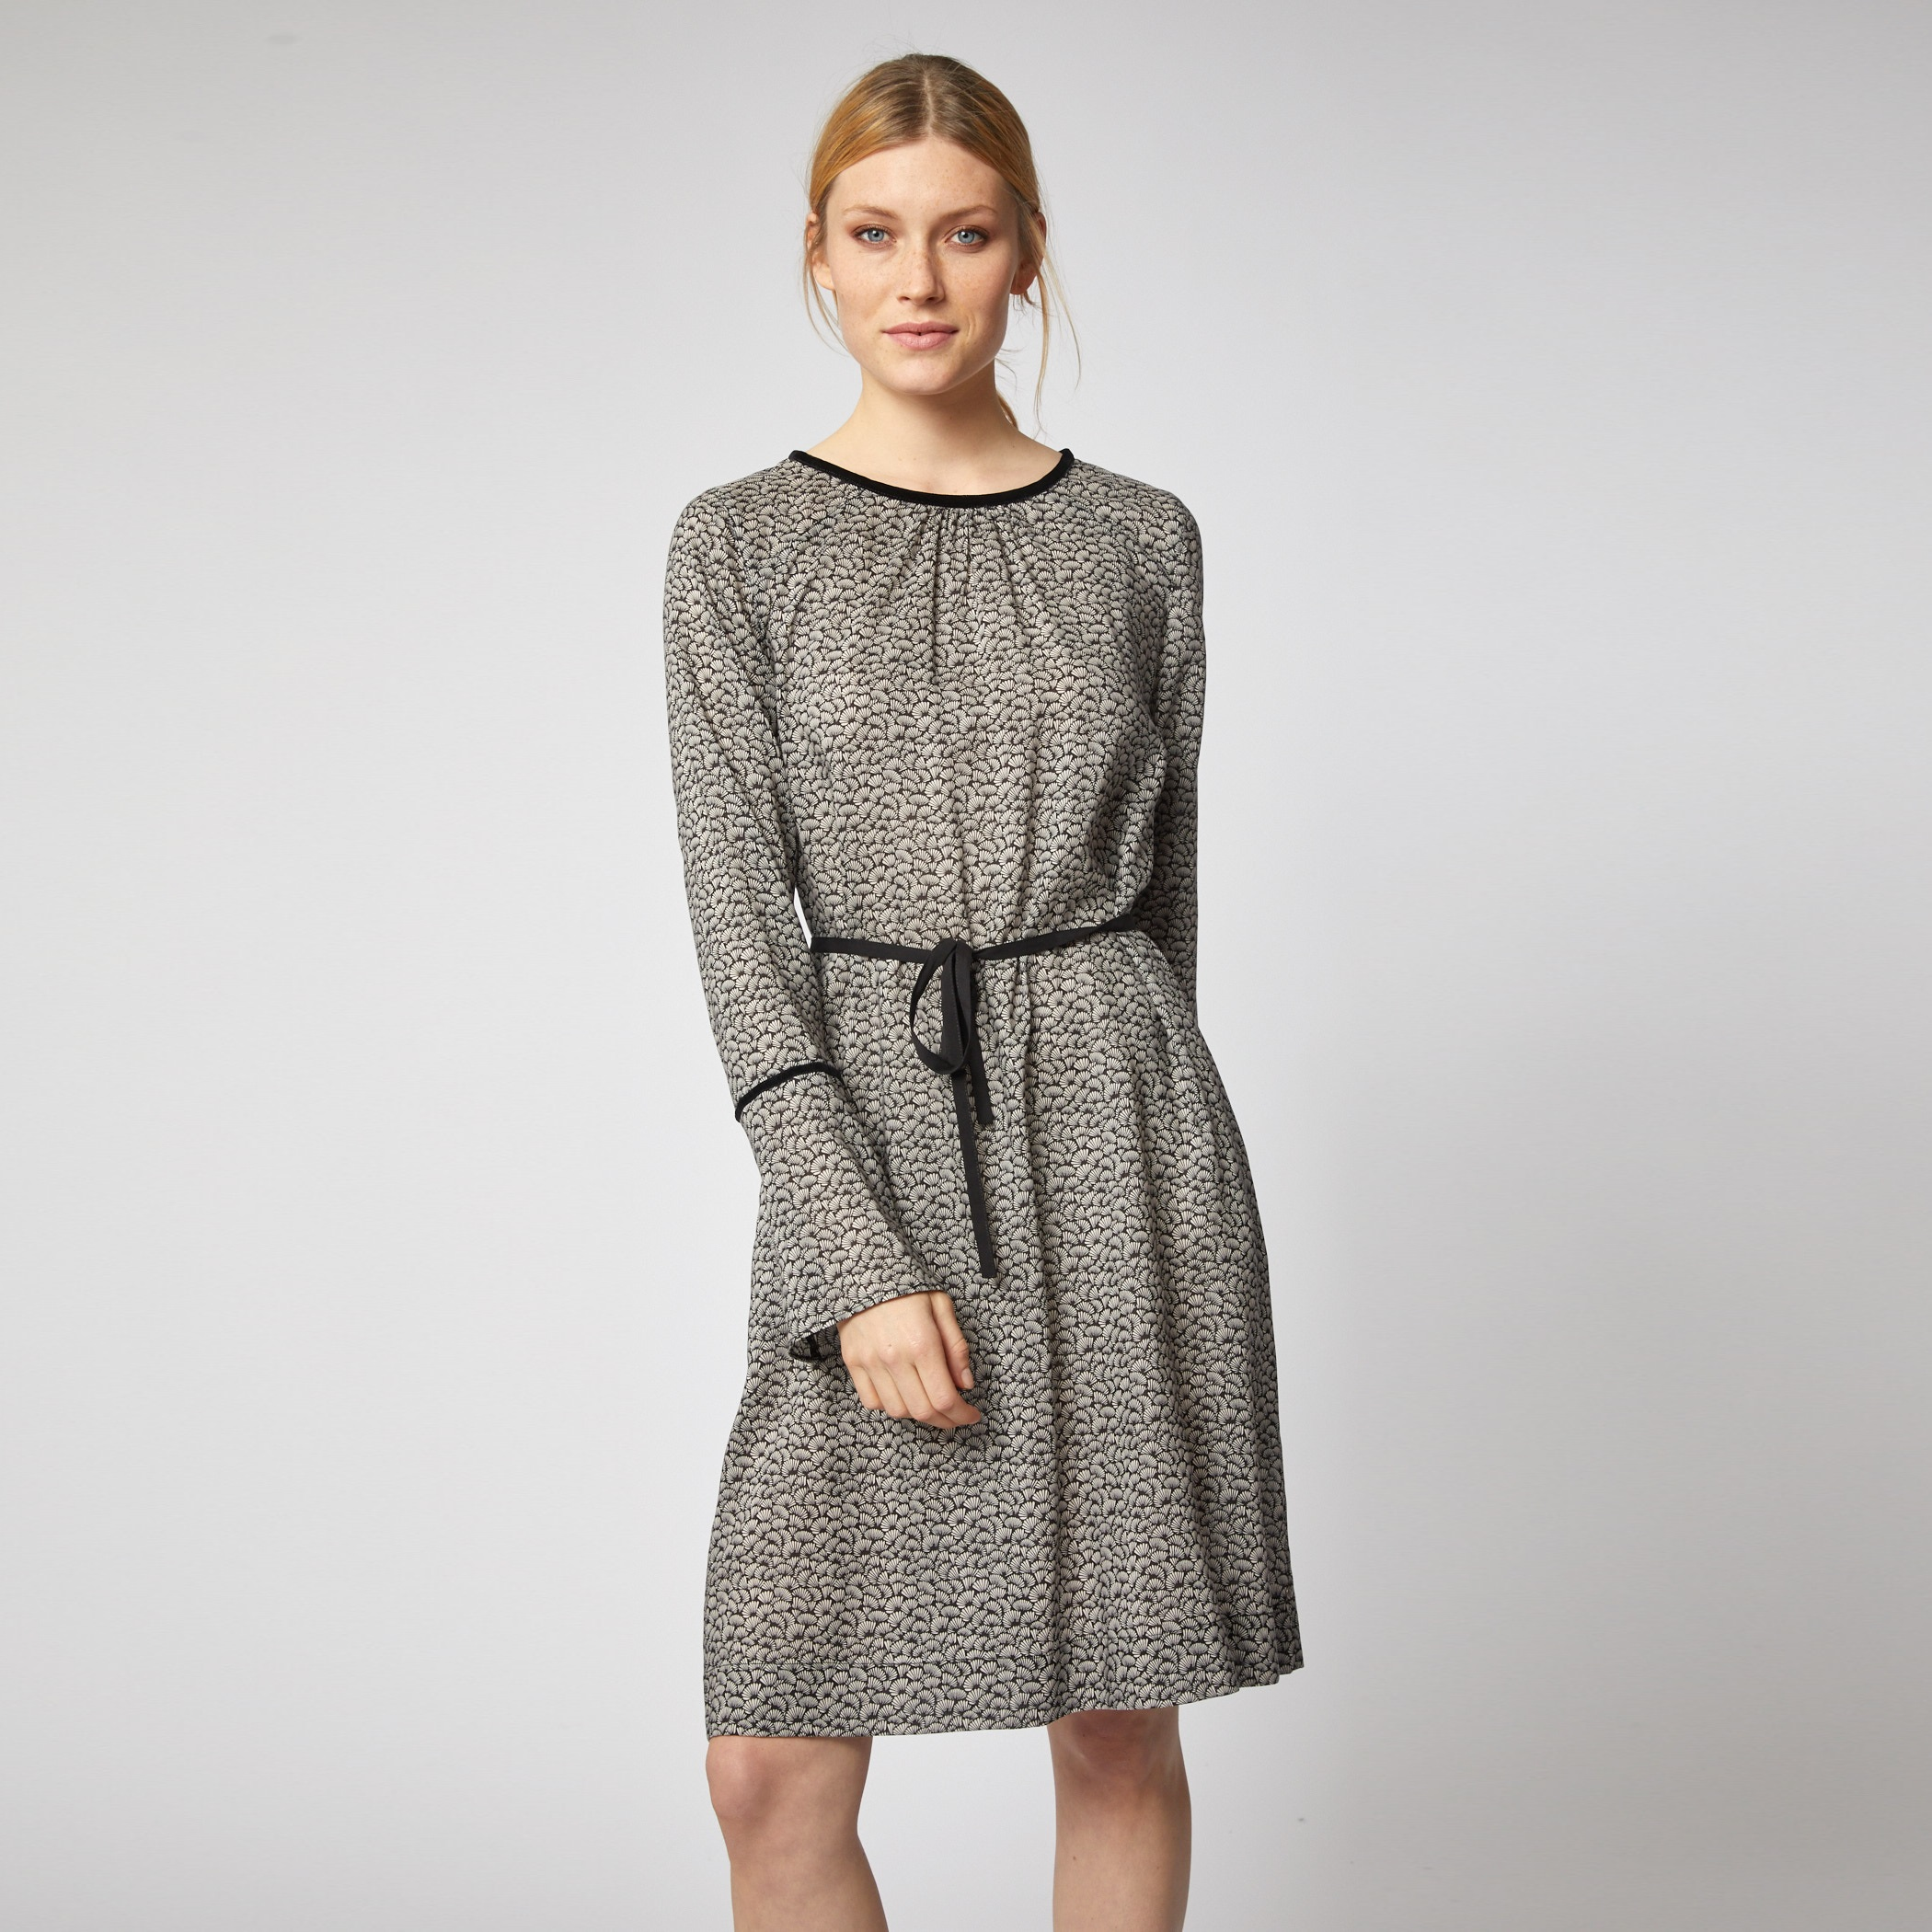 1077fe6a7ec01b Kleid aus Tencel Print Leaves - FairRoots